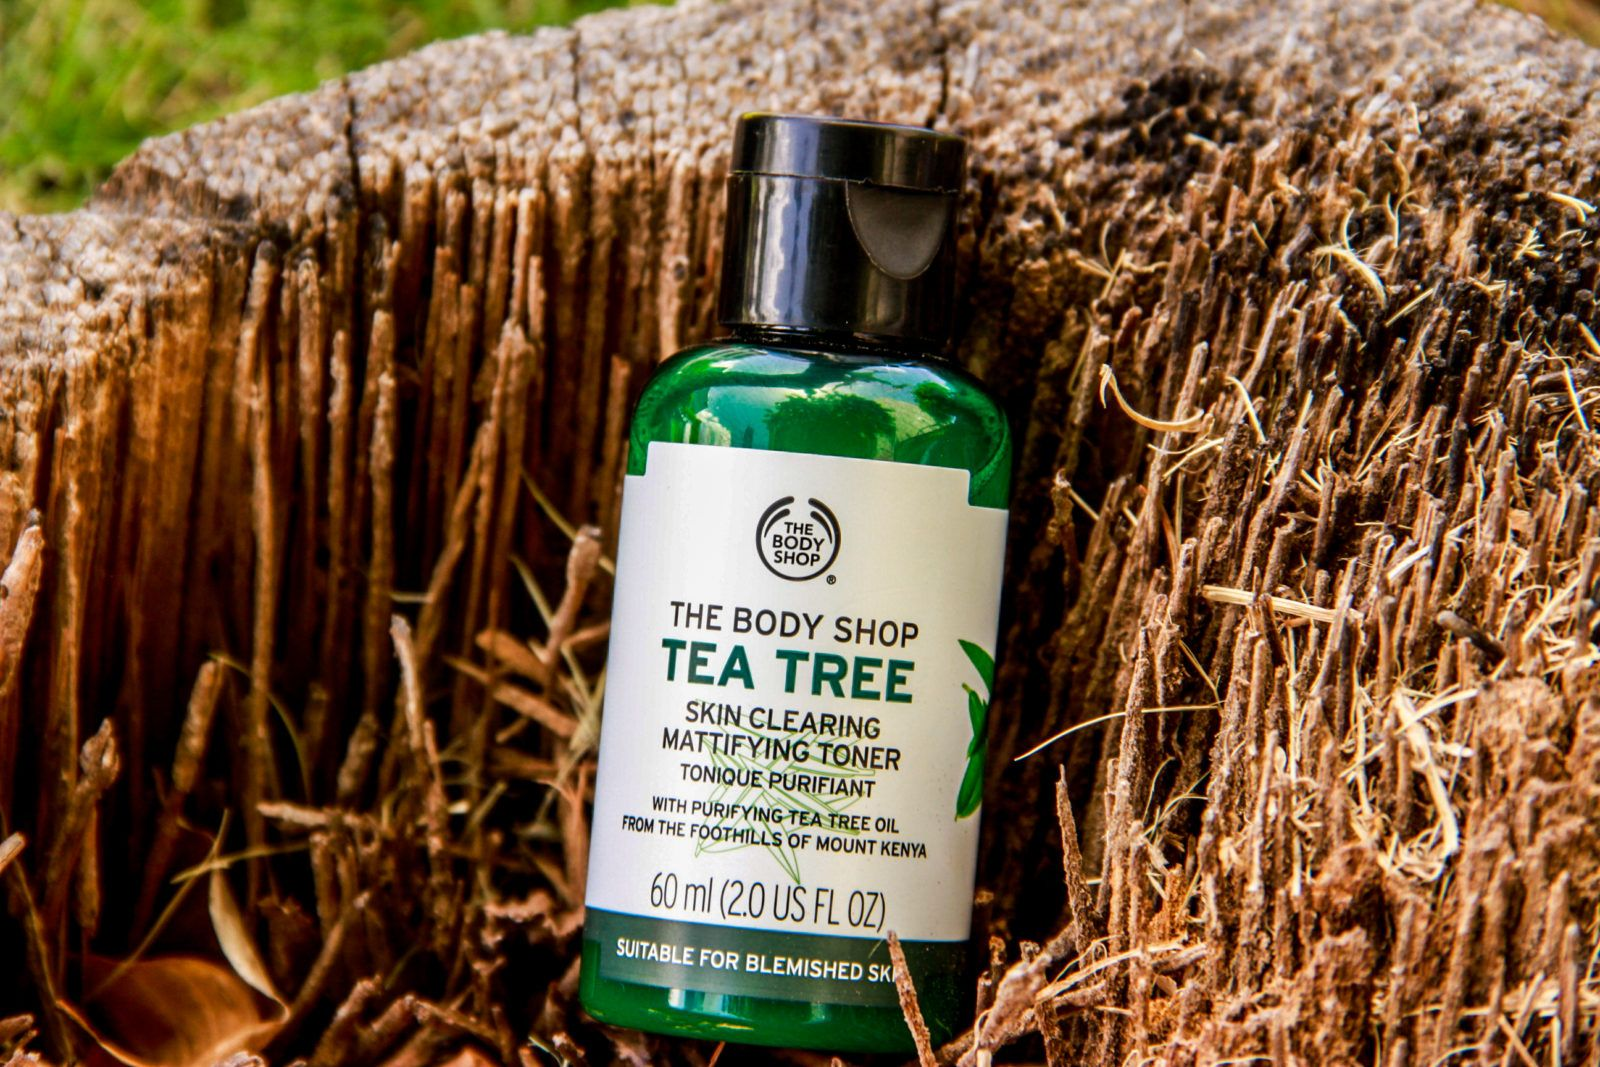 The Body Shop's Tea Tree Skin Clearing Facial Wash & Toner - SHEVIIMC